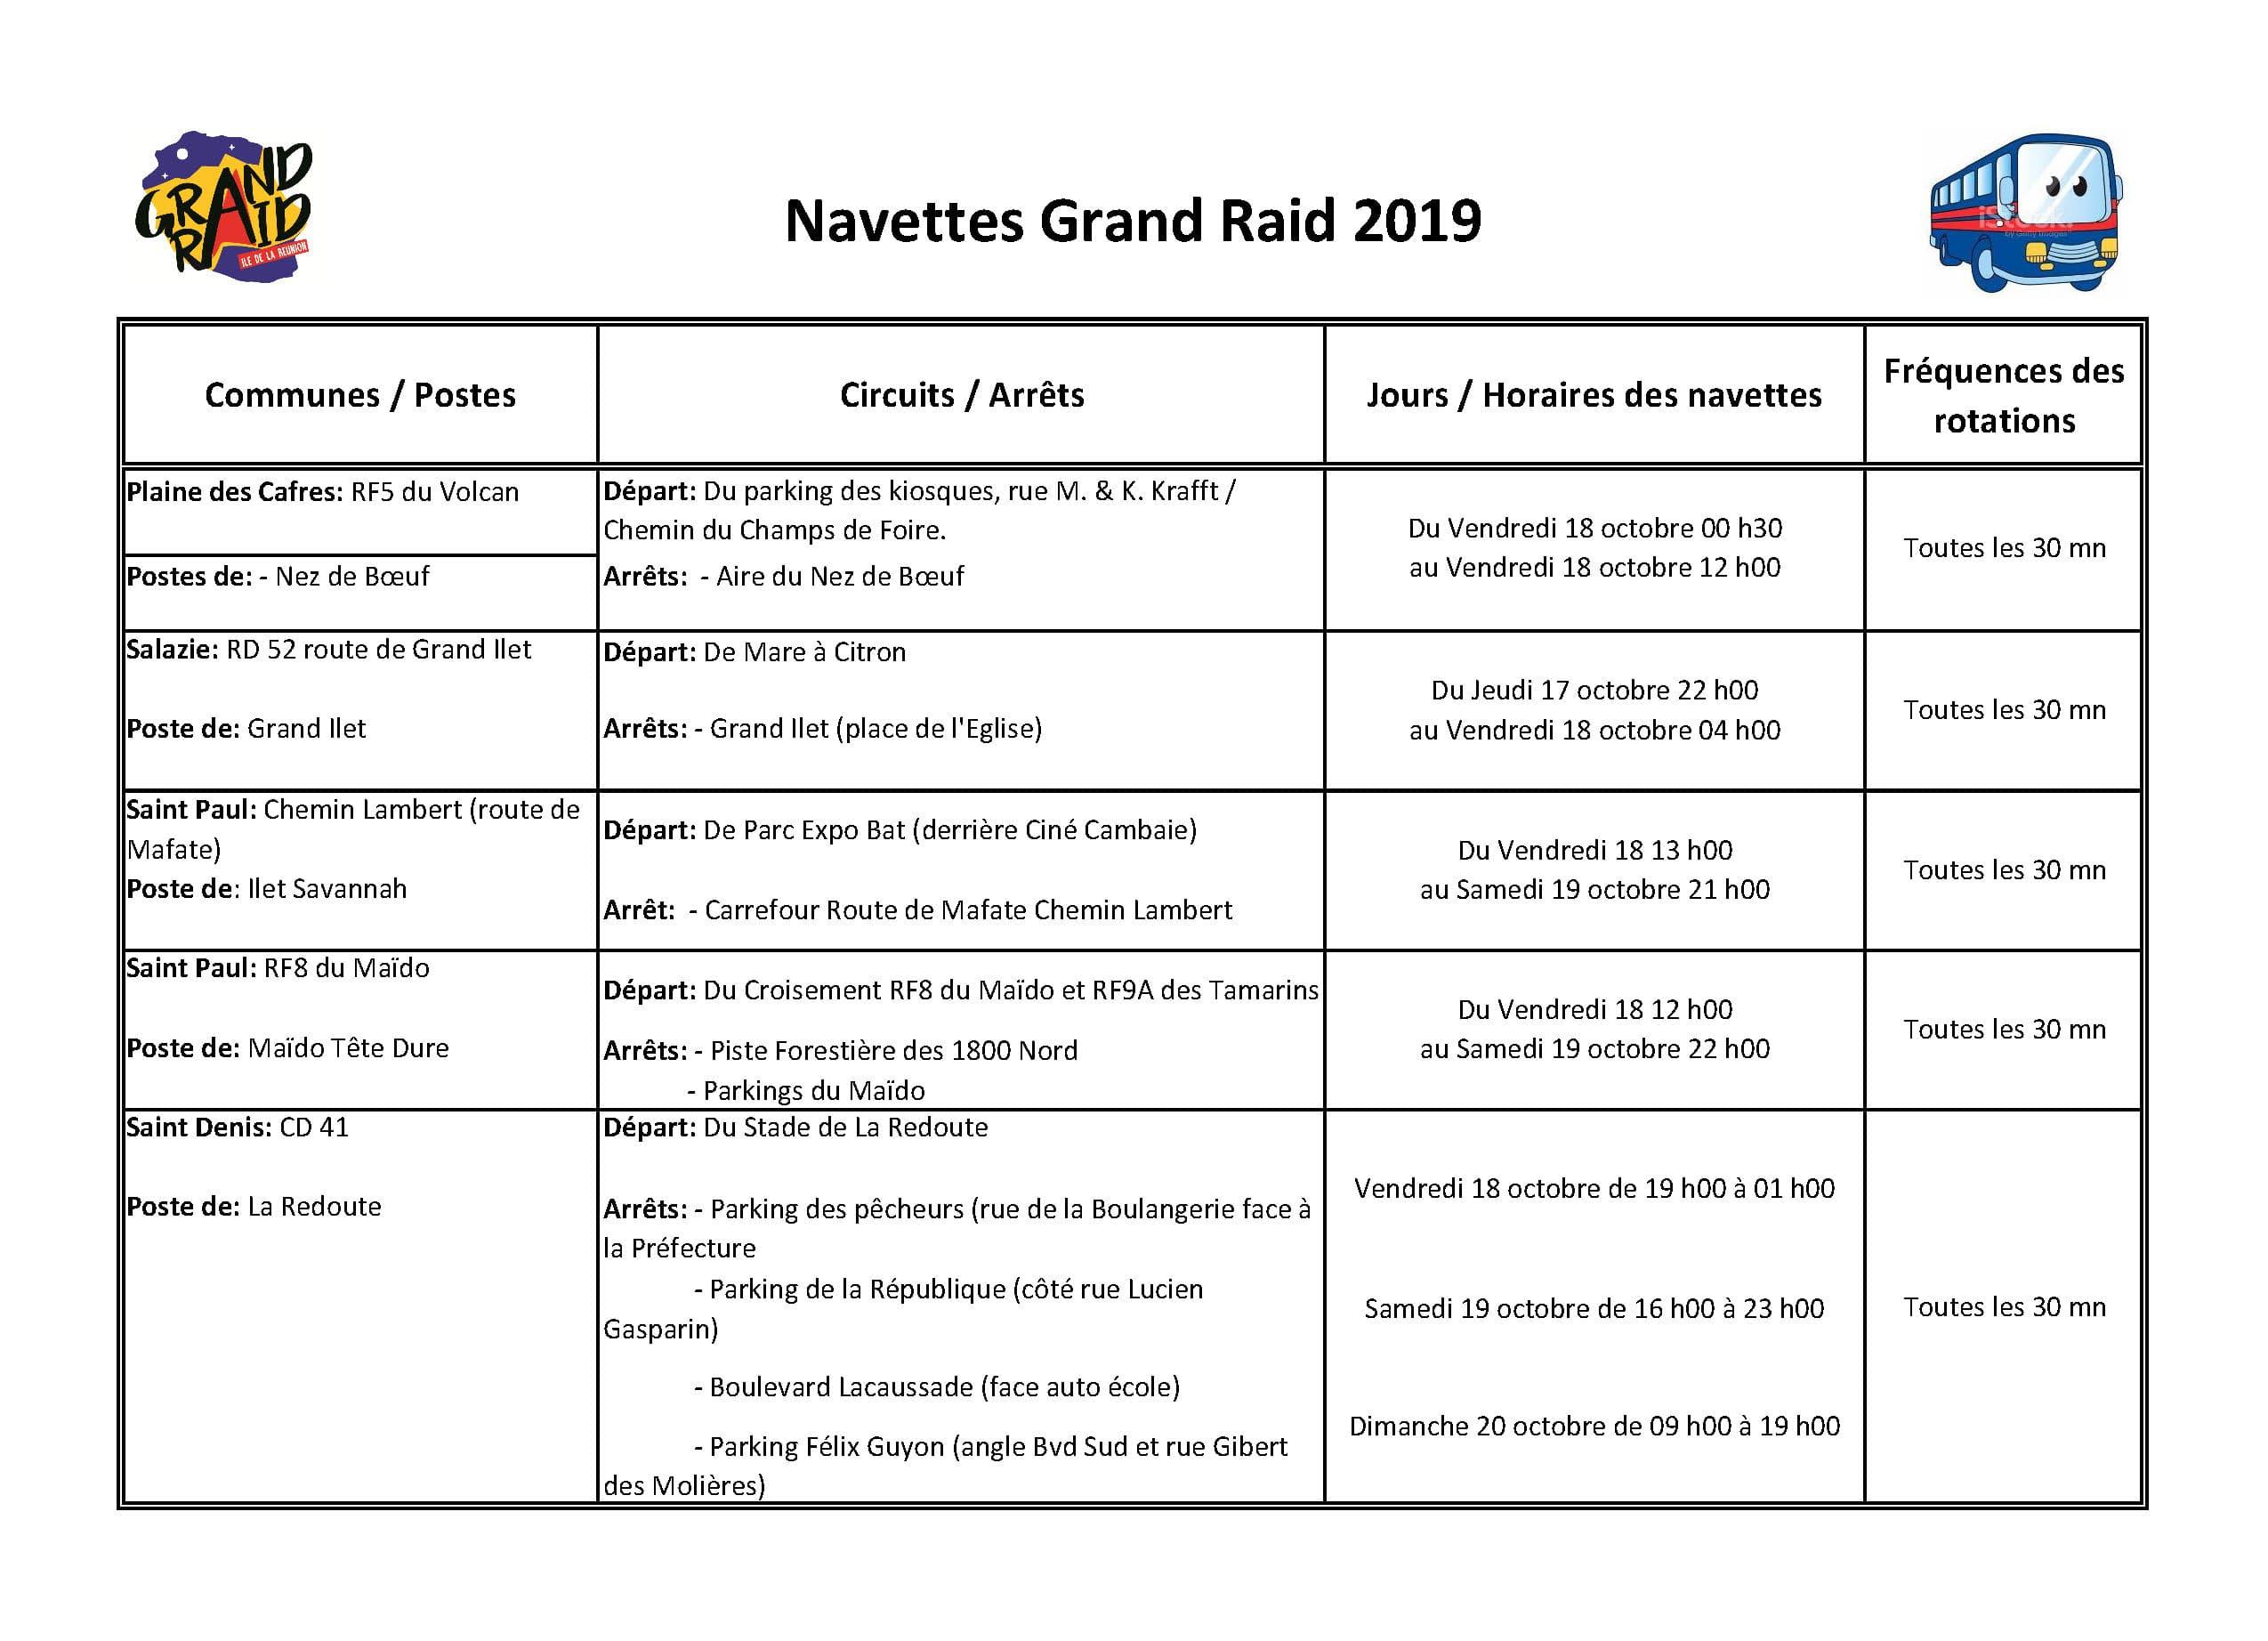 Navettes-Grand-Raid-2019